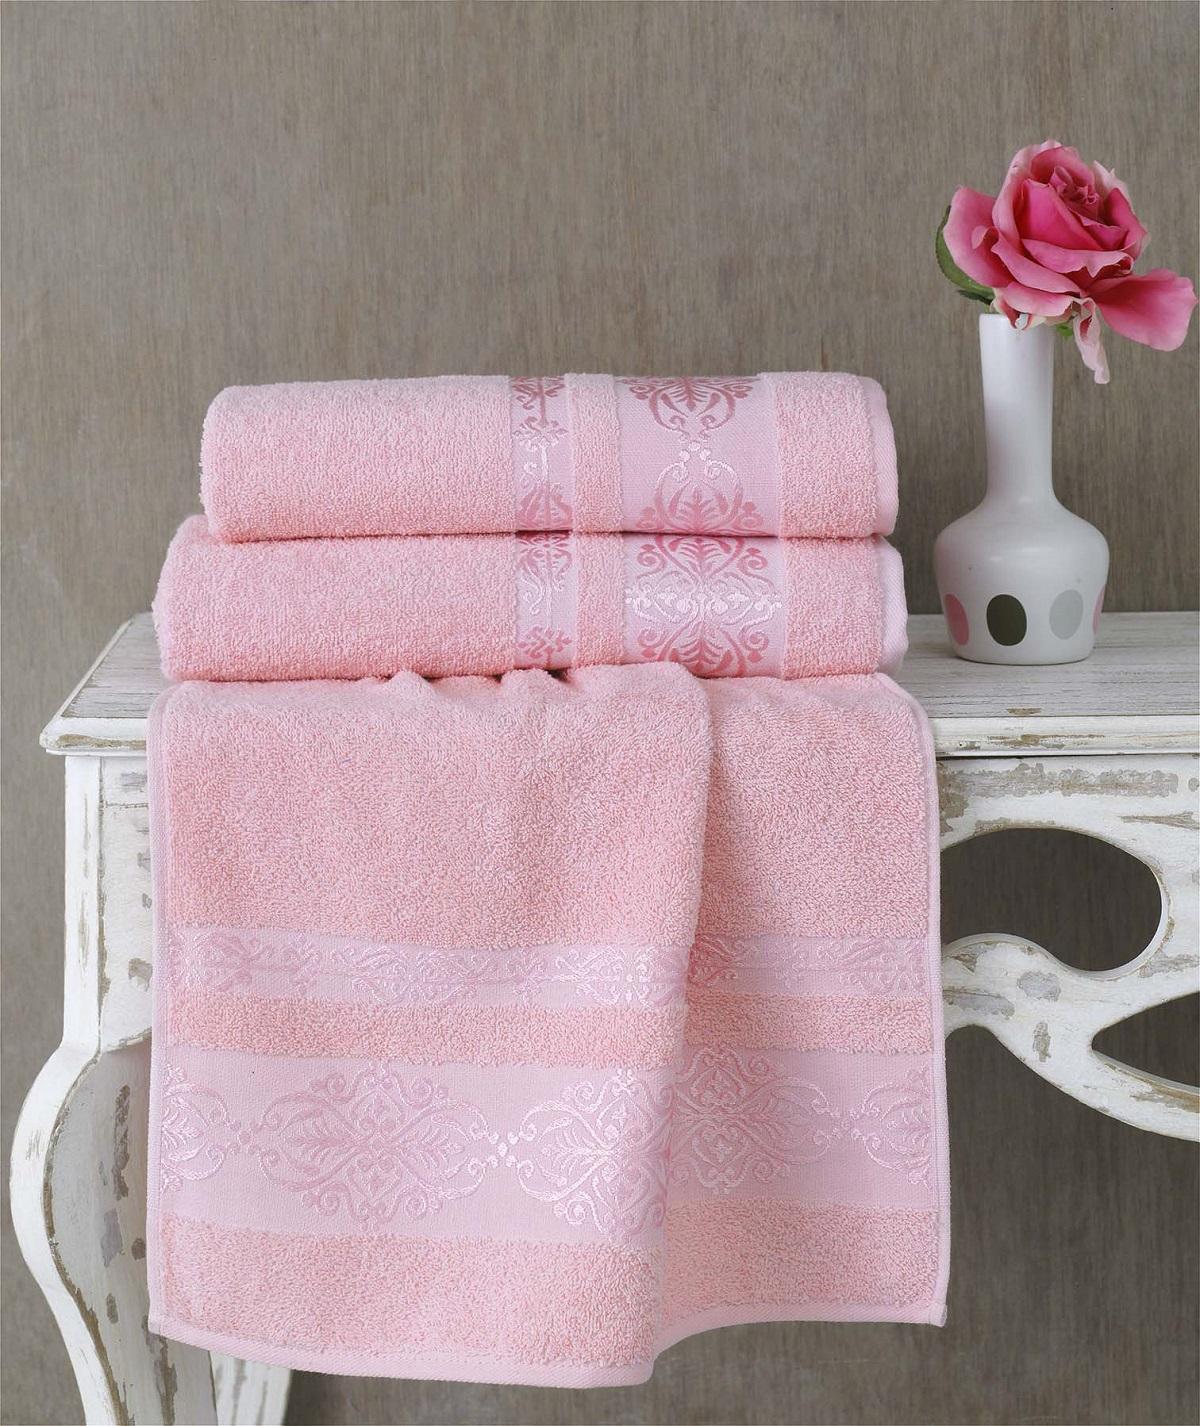 Полотенца Karna Полотенце Rebeka Цвет: Светло-Розовый (70х140 см) полотенца karna полотенце iteka цвет коричневый 70х140 см